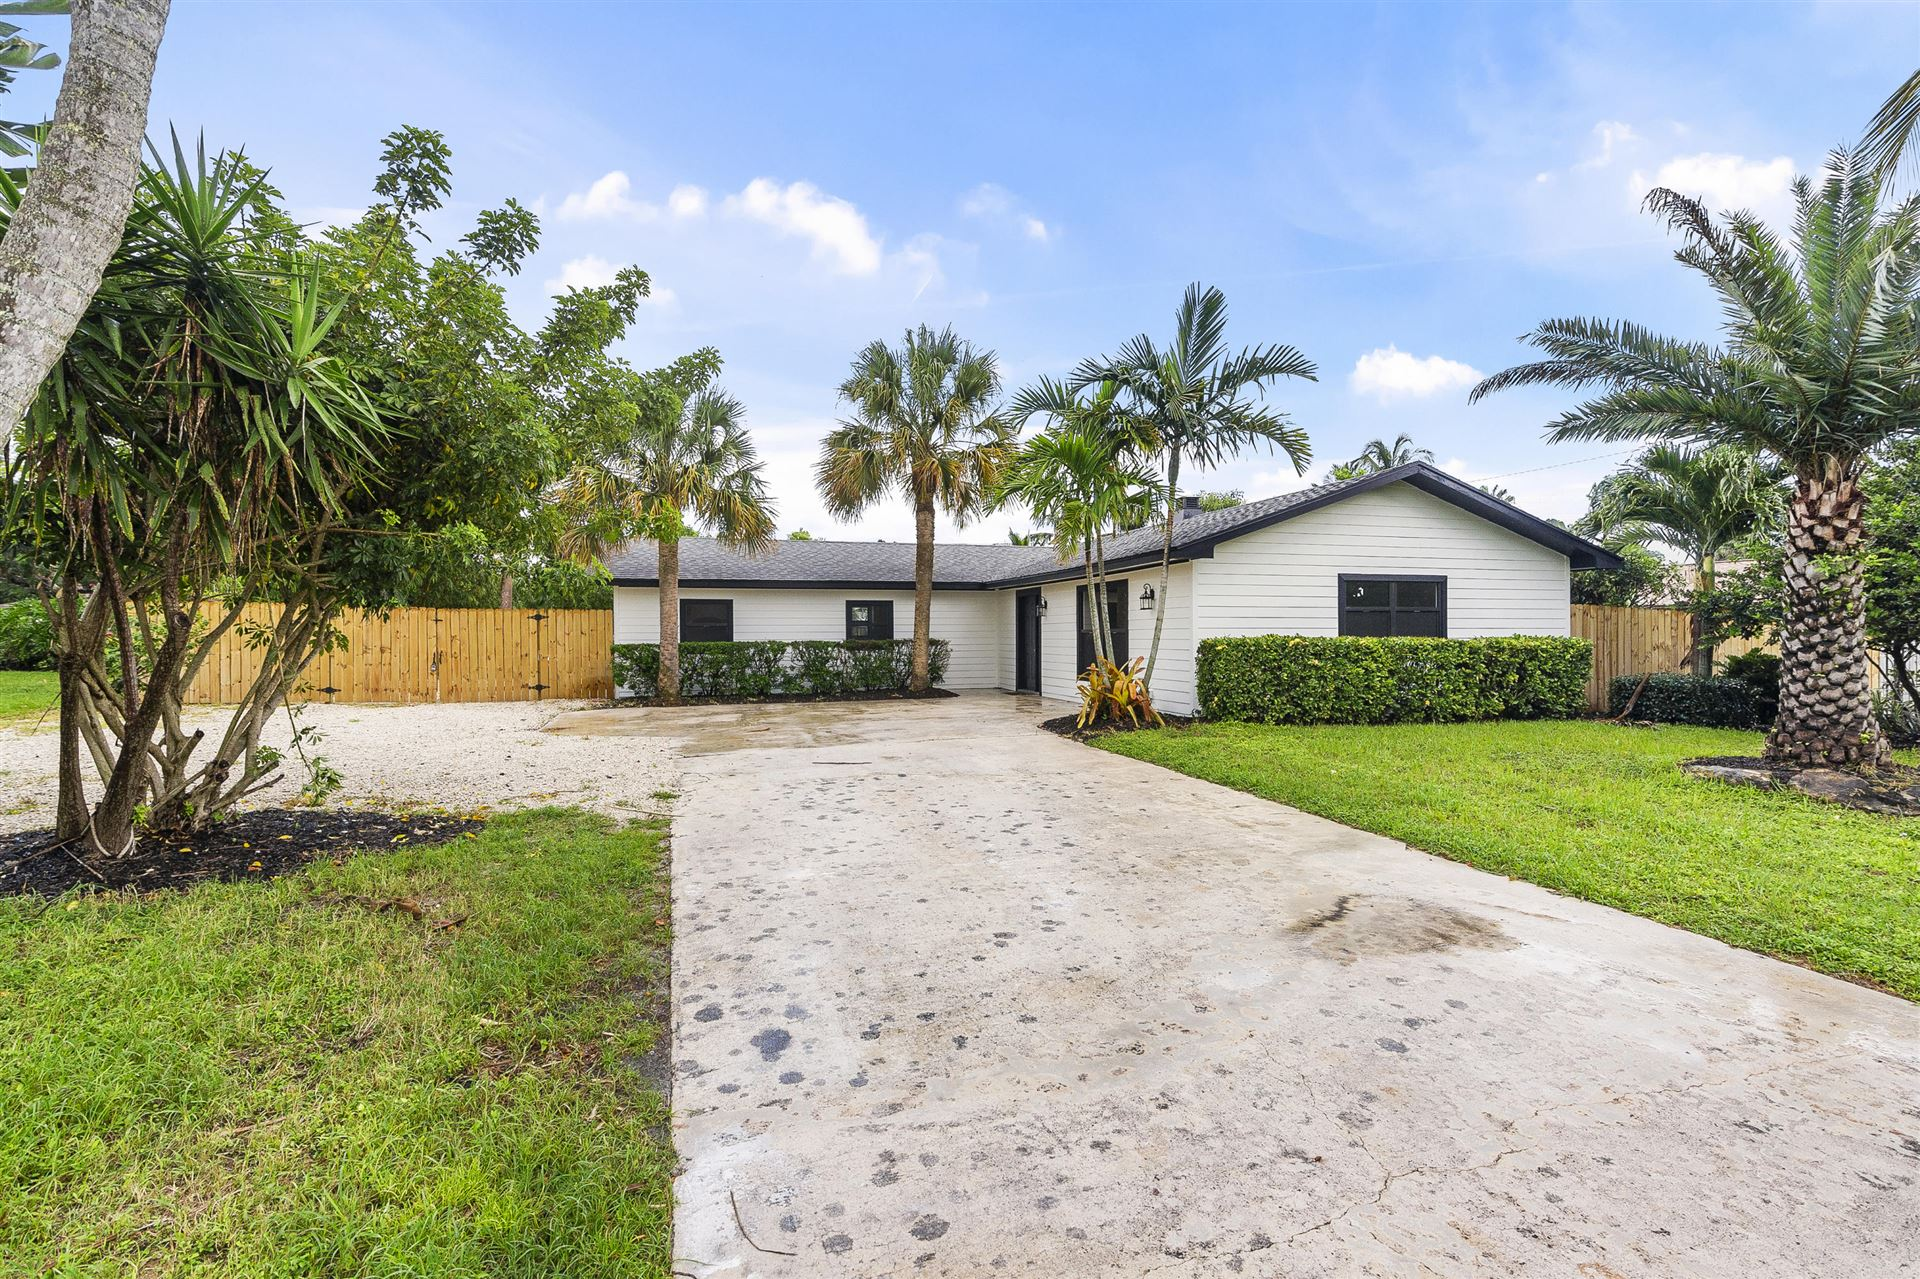 8127 SE Coconut Street, Hobe Sound, FL 33455 - #: RX-10644719